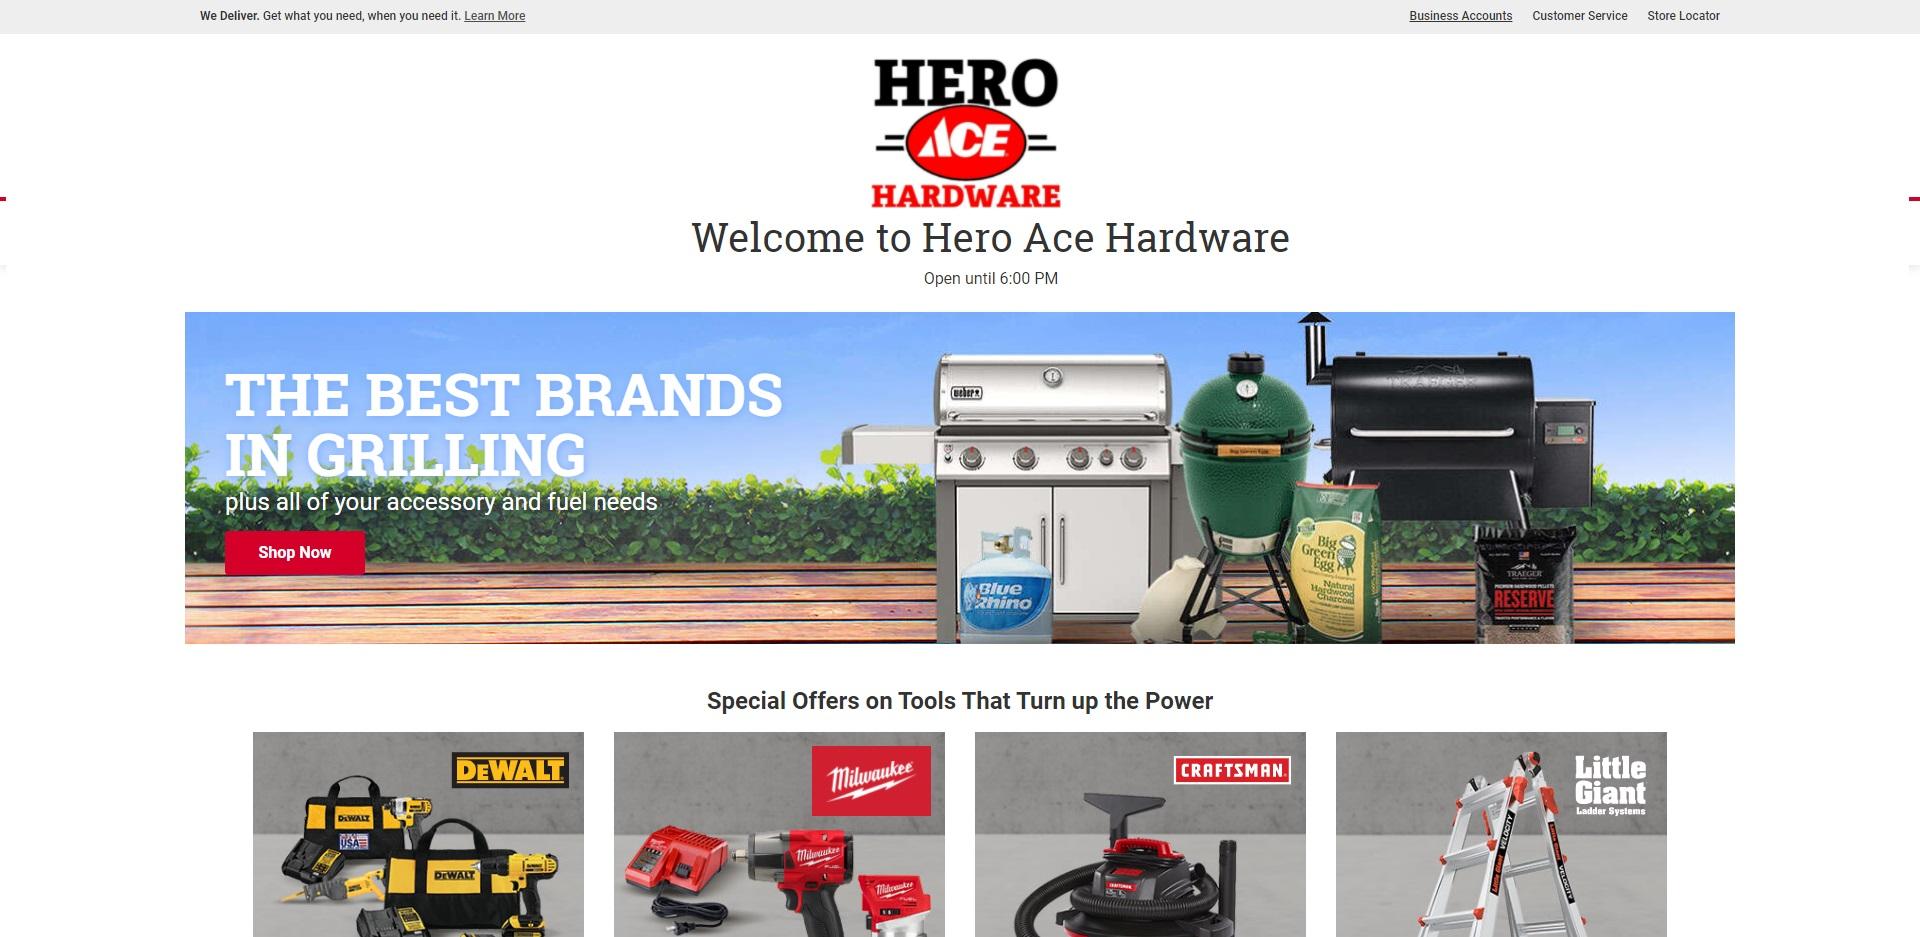 5 Best Hardware Stores in Seattle, WA